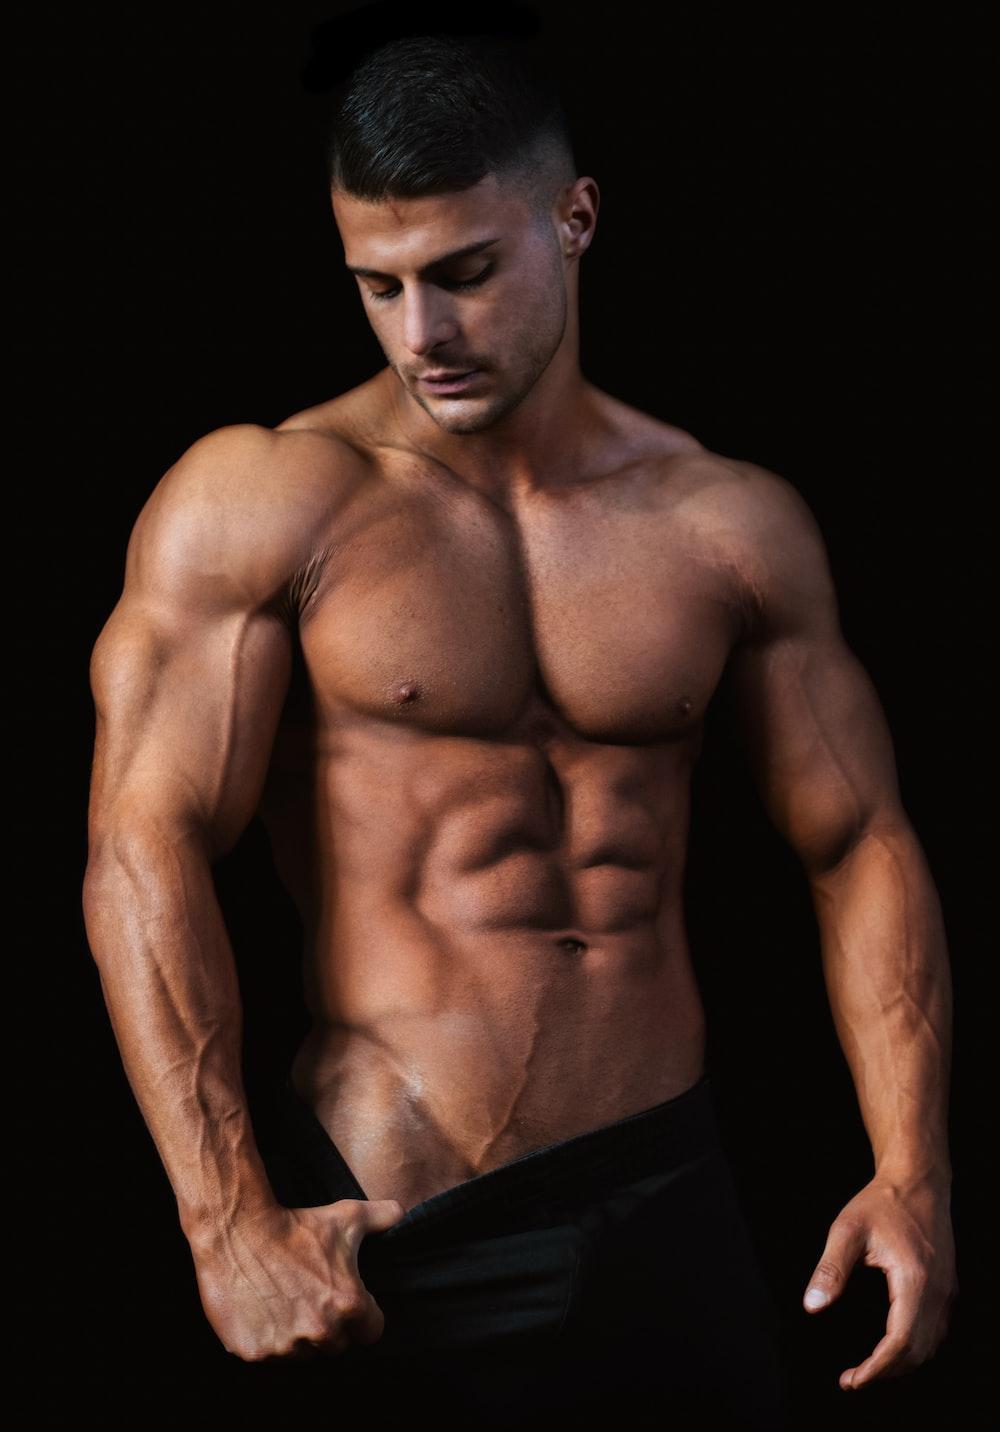 topless man wearing black pants